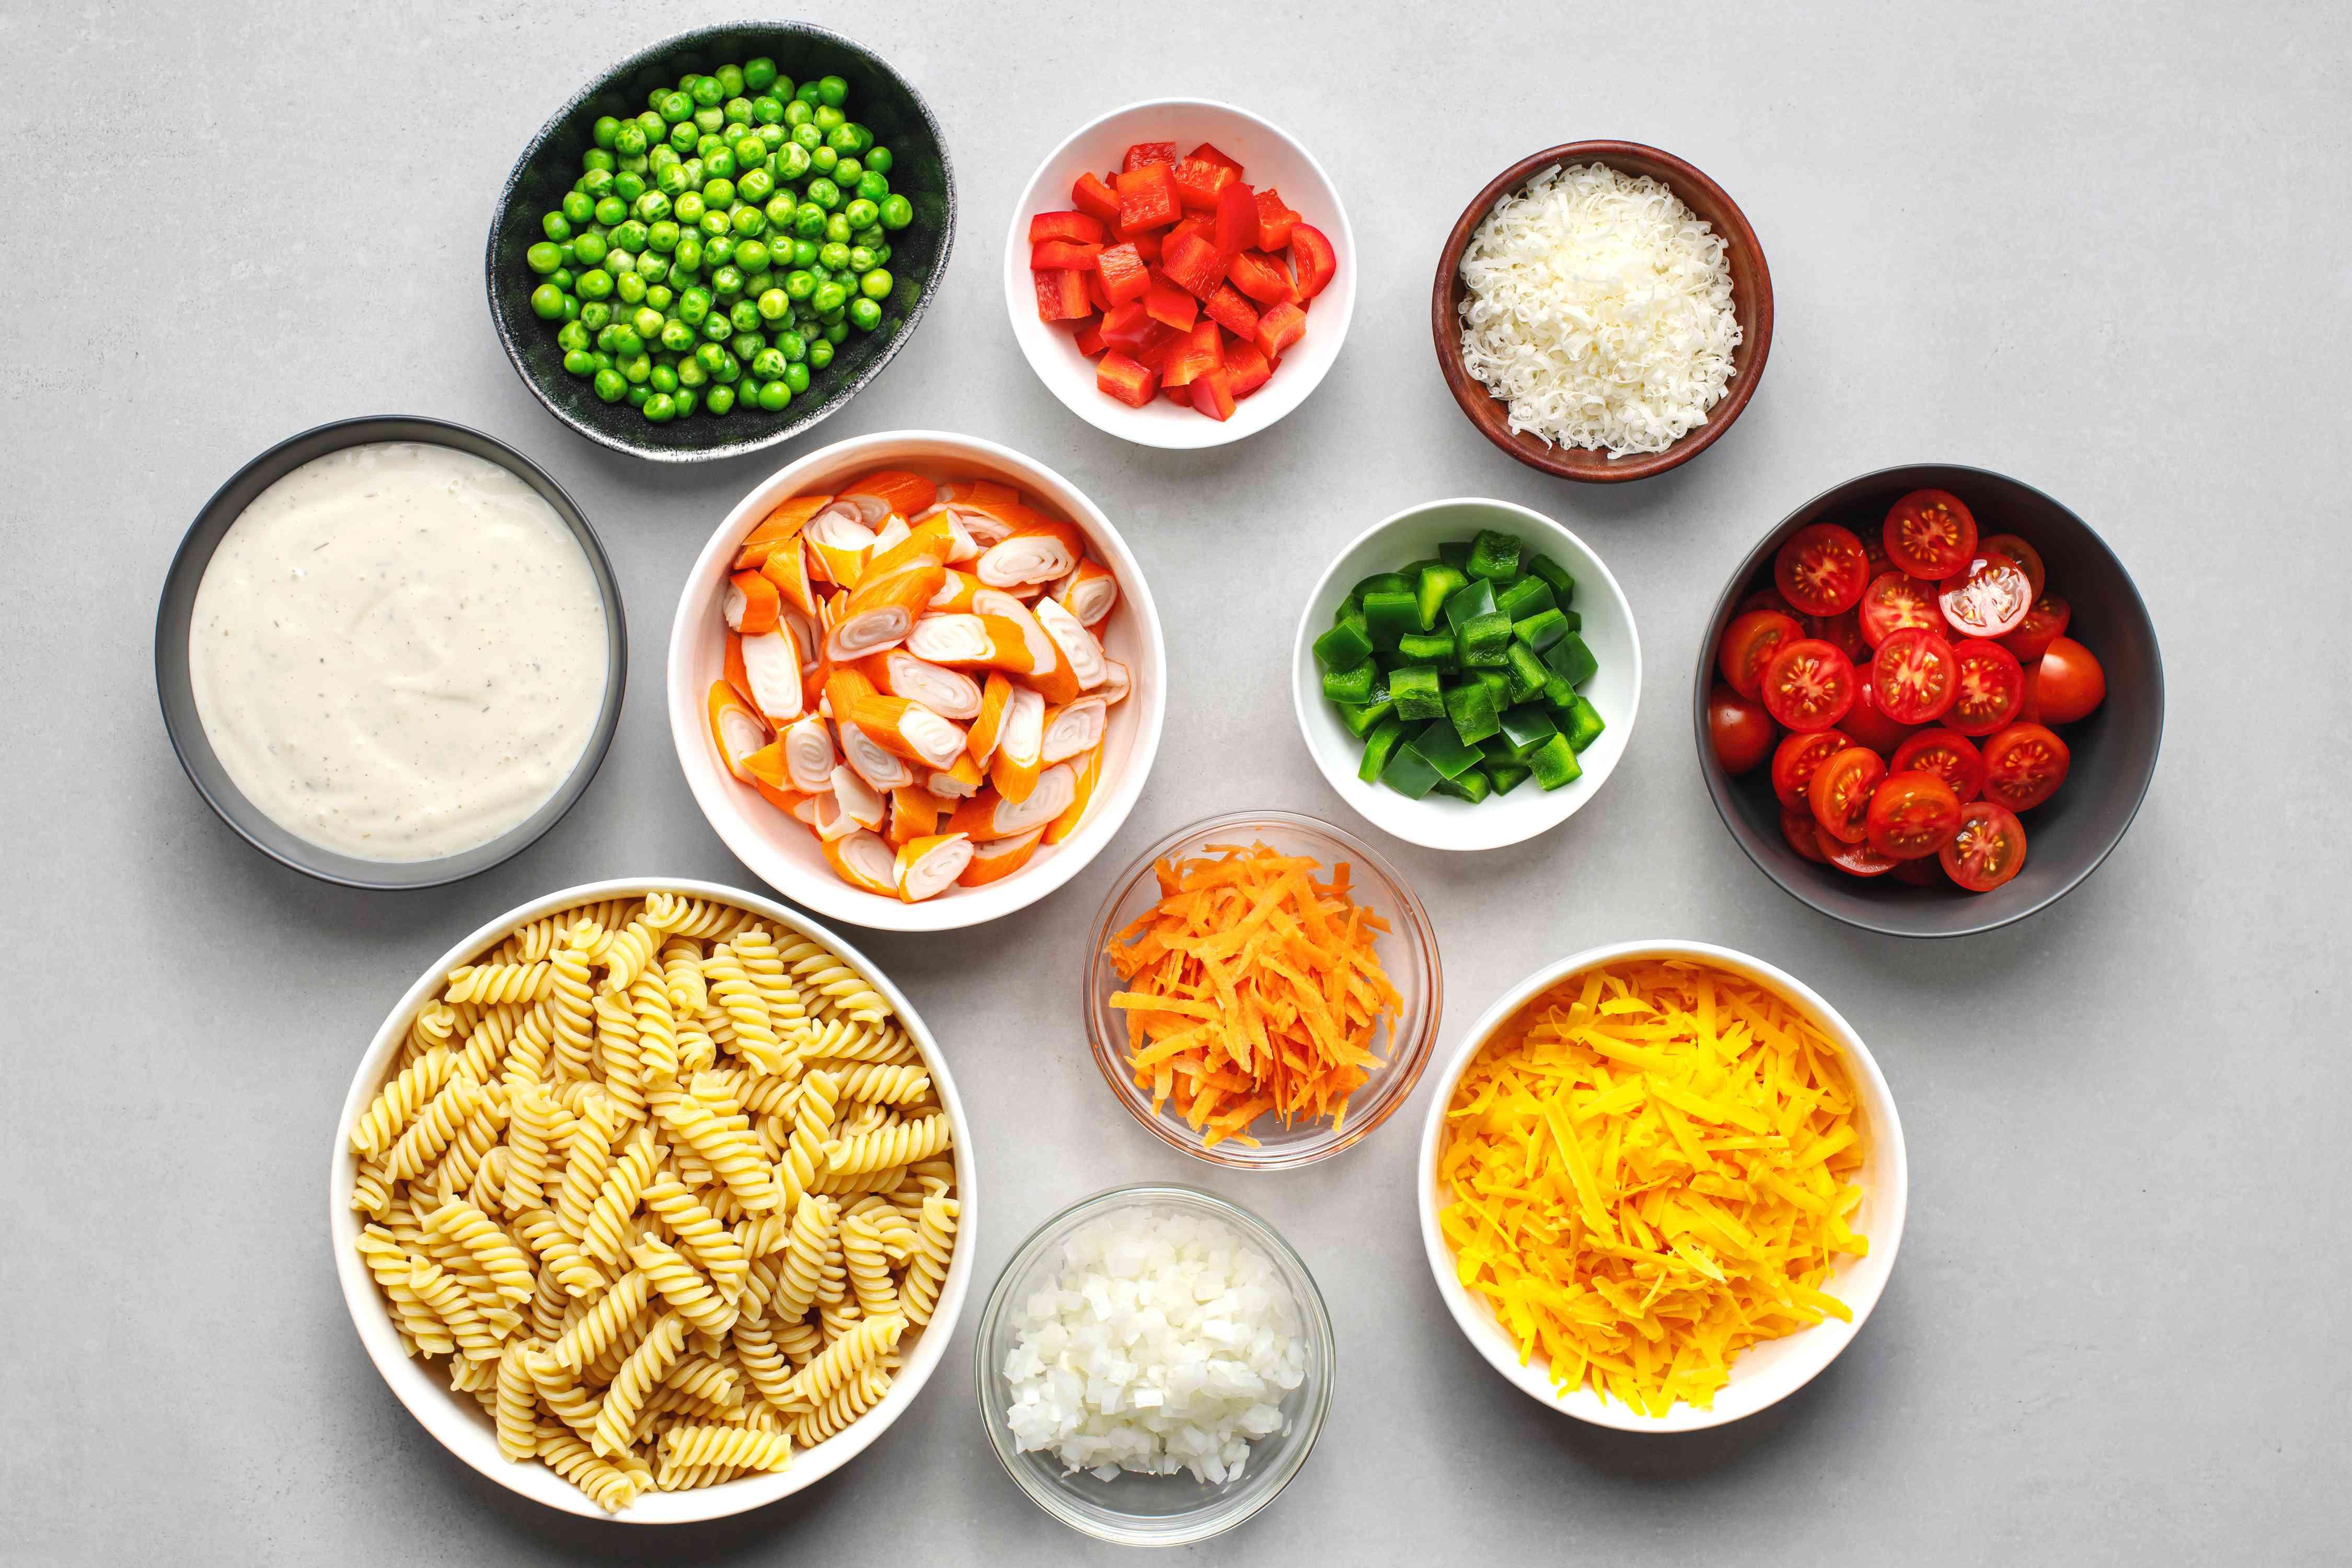 Summer Seafood Pasta Salad ingredients